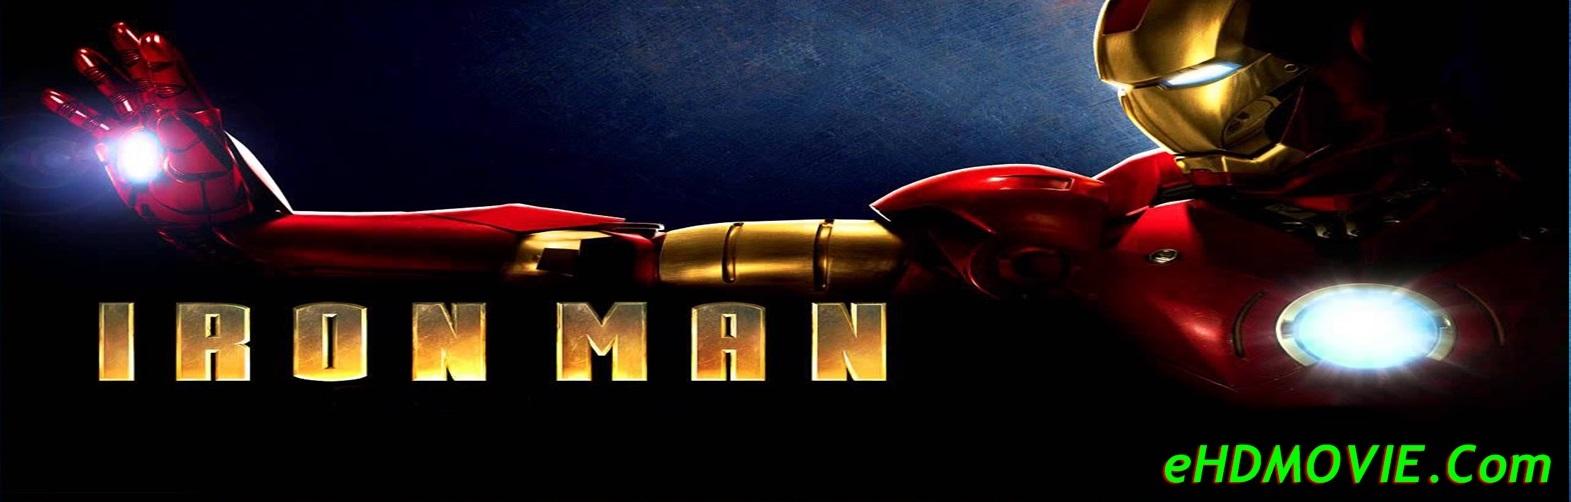 Iron Man 2008 Full Movie Dual Audio [Hindi – English] 1080p - 720p - 480p ORG BRRip 350MB - 750MB - 4.9GB ESubs Free Download